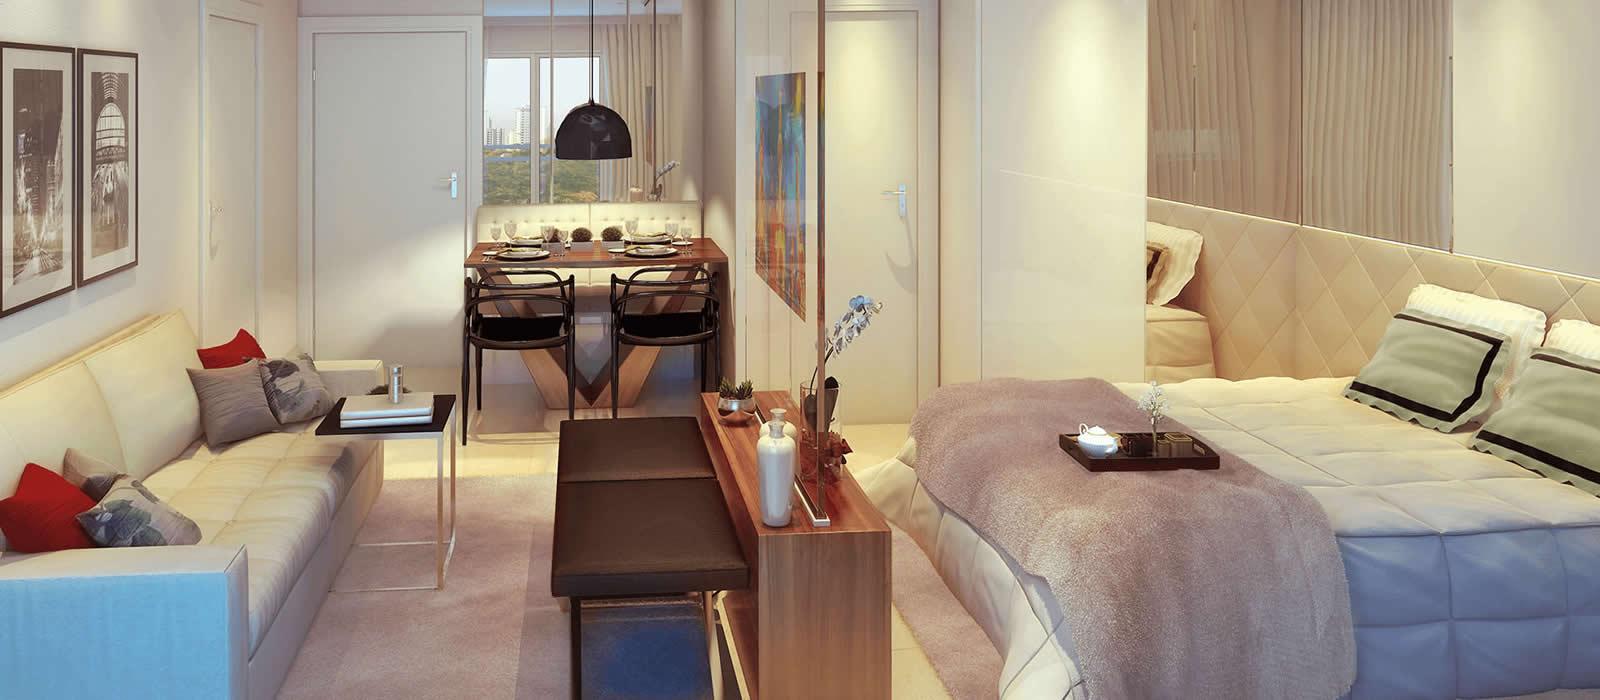 Ph.D   Personal Home Design